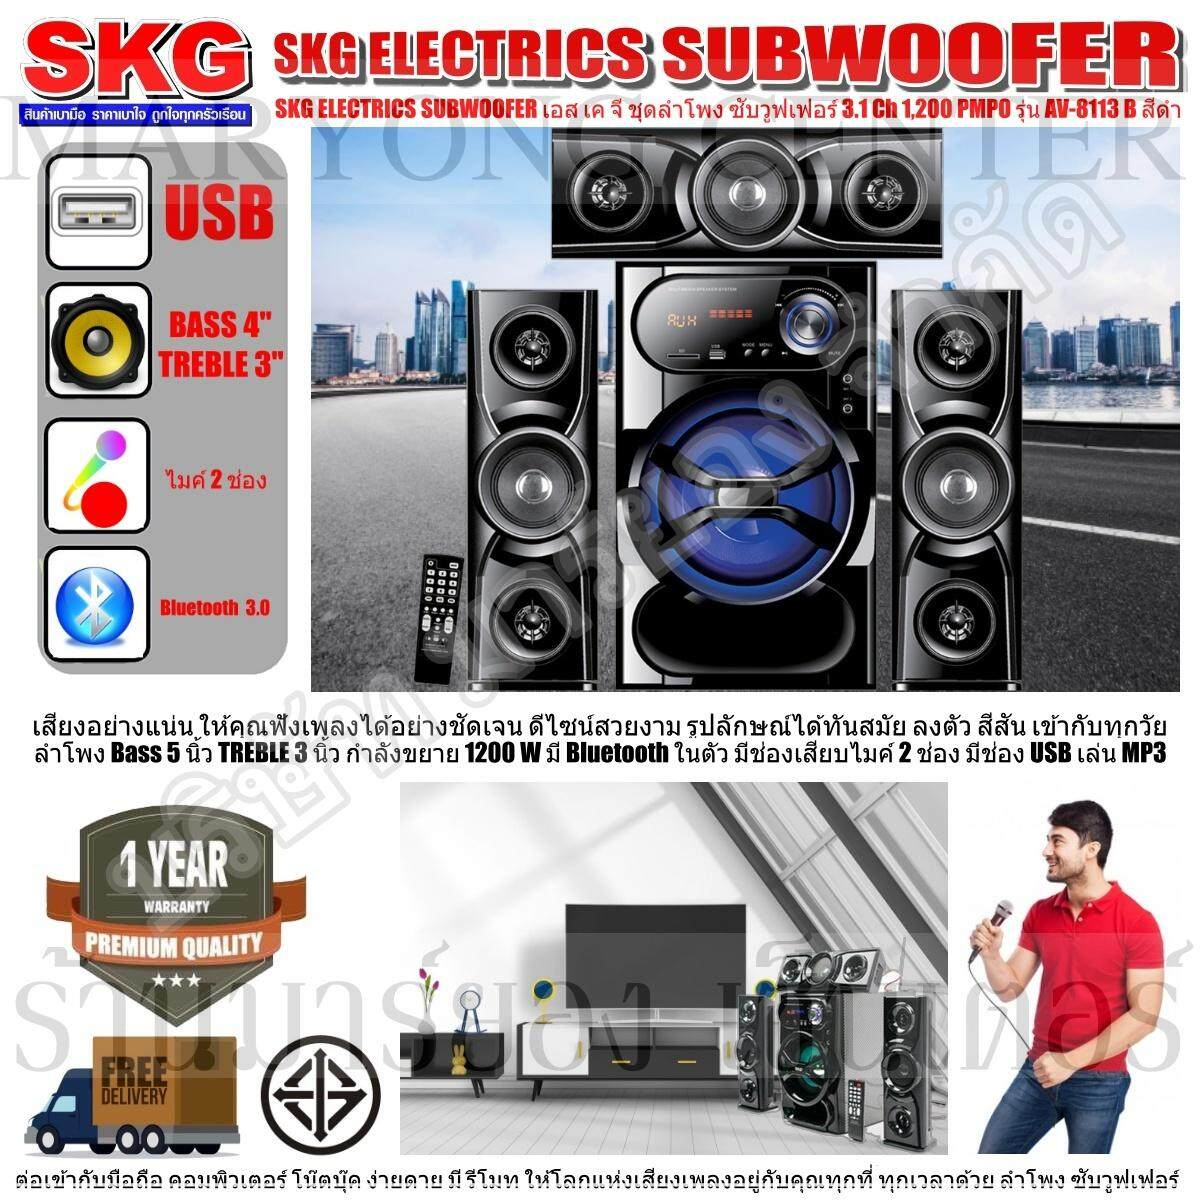 Skg Electrics Subwoofer เอส เค จี ชุดลำโพง ซับวูฟเฟอร์ 3.1 Ch 1,200 Pmpo รุ่น Av-8113 B สีดำ ลำโพง Bass 5 นิ้ว Treble 3 นิ้ว กำลังขยาย 1200 W มี Bluetooth ในตัว มีช่องเสียบไมค์ 2 ช่อง มีช่อง Usb เล่น Mp3 V19 2n-02 By Hua Hin.